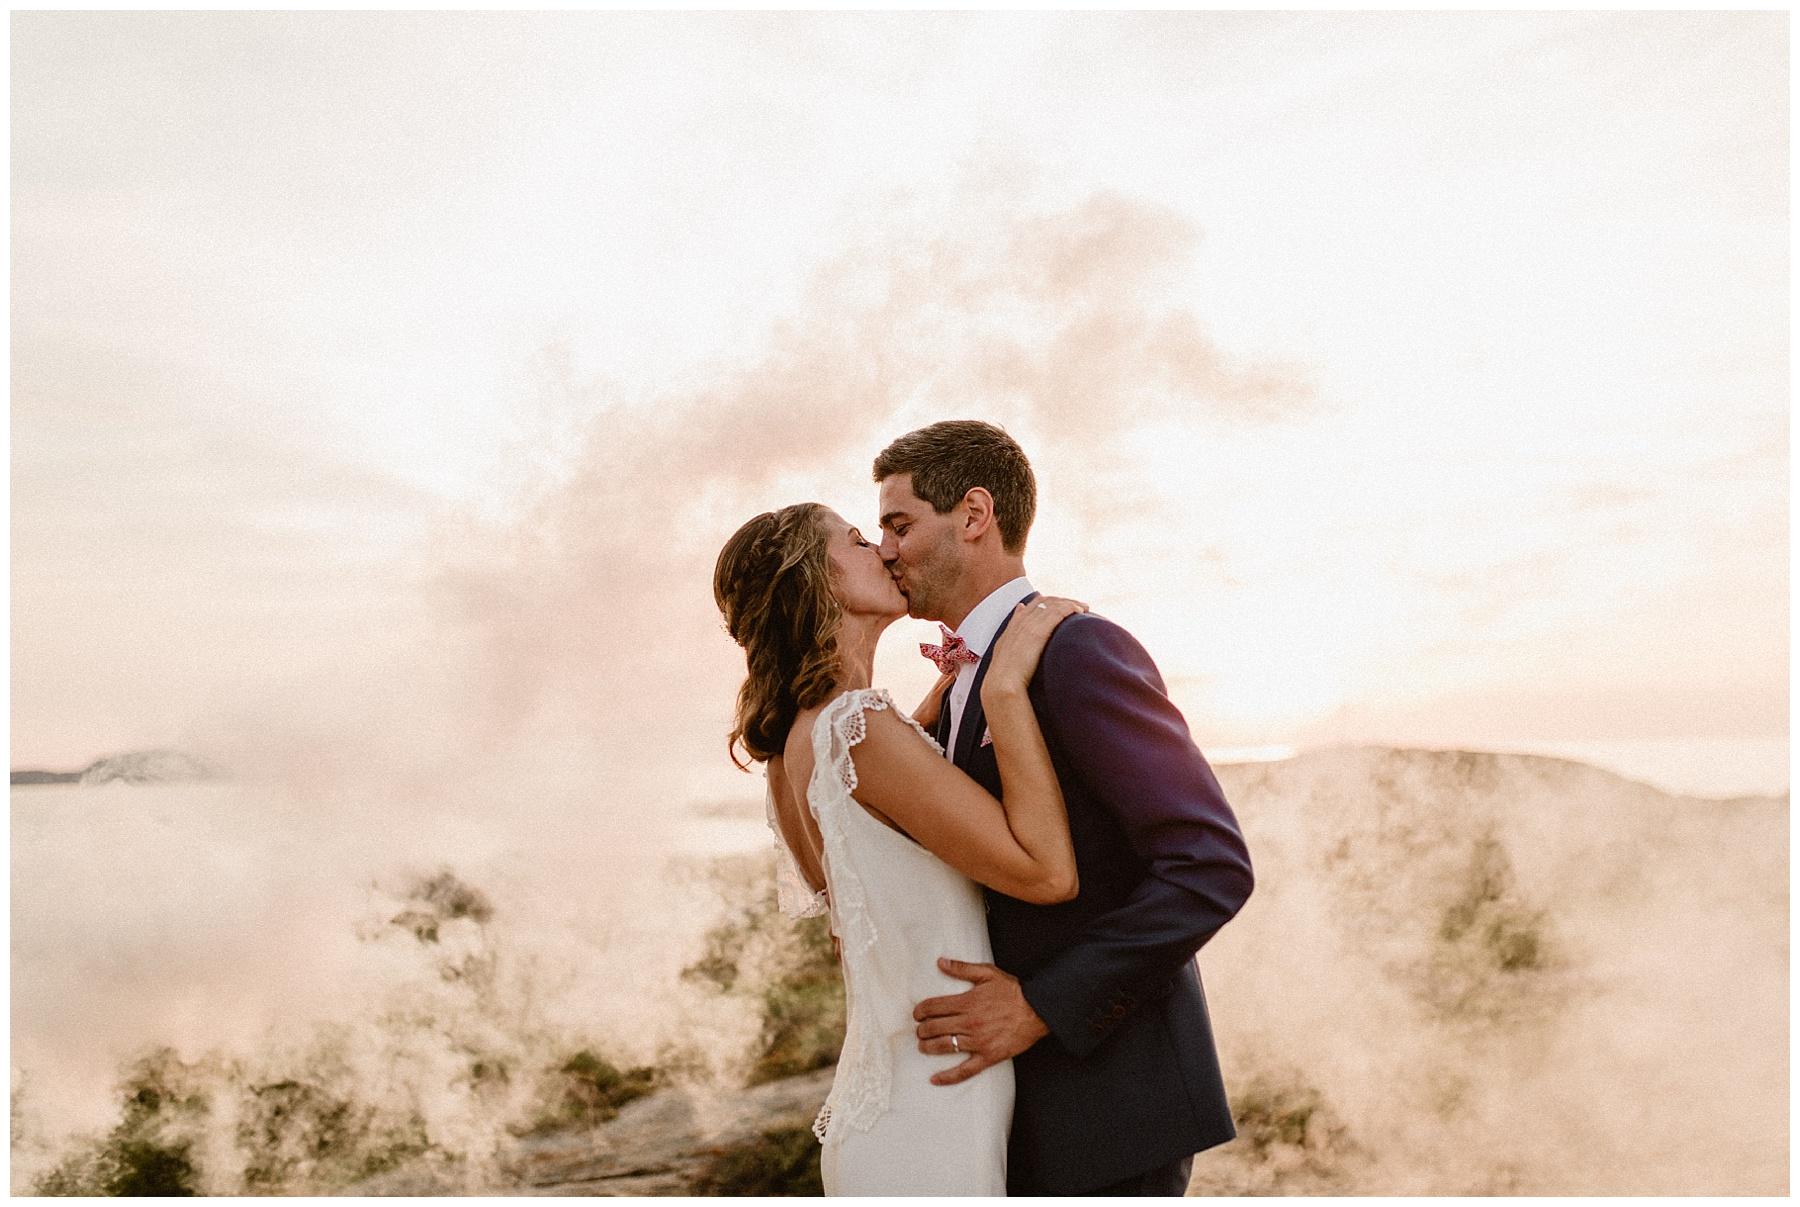 Mariage le rocher Spanu